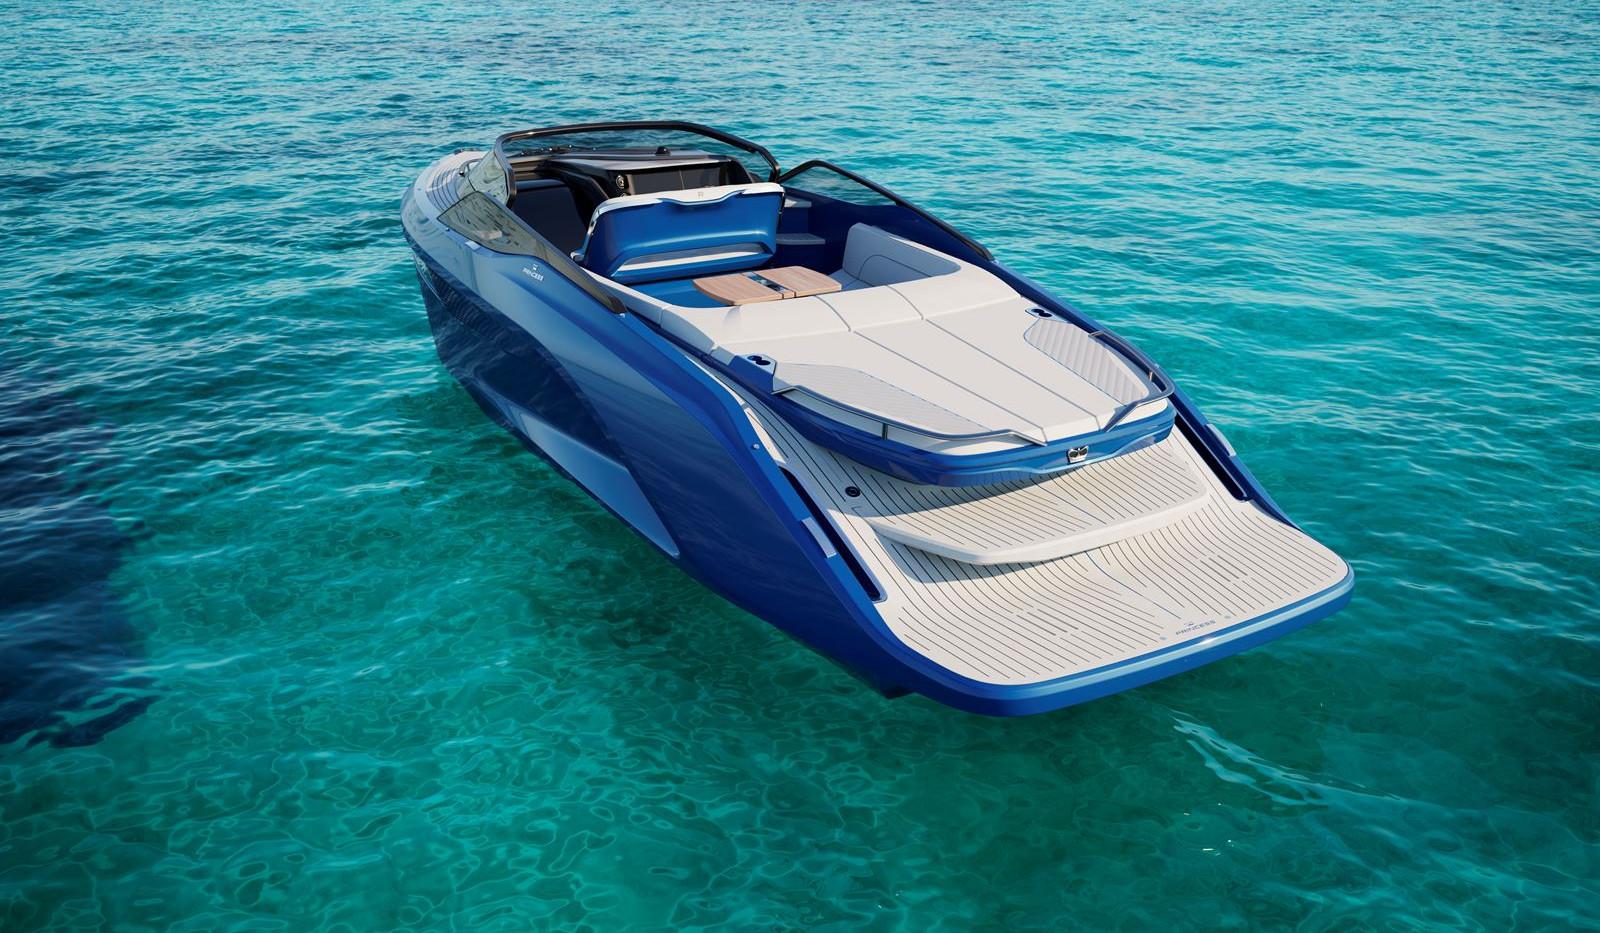 r35-exterior-rear-viewAbromowitz Sharp Y